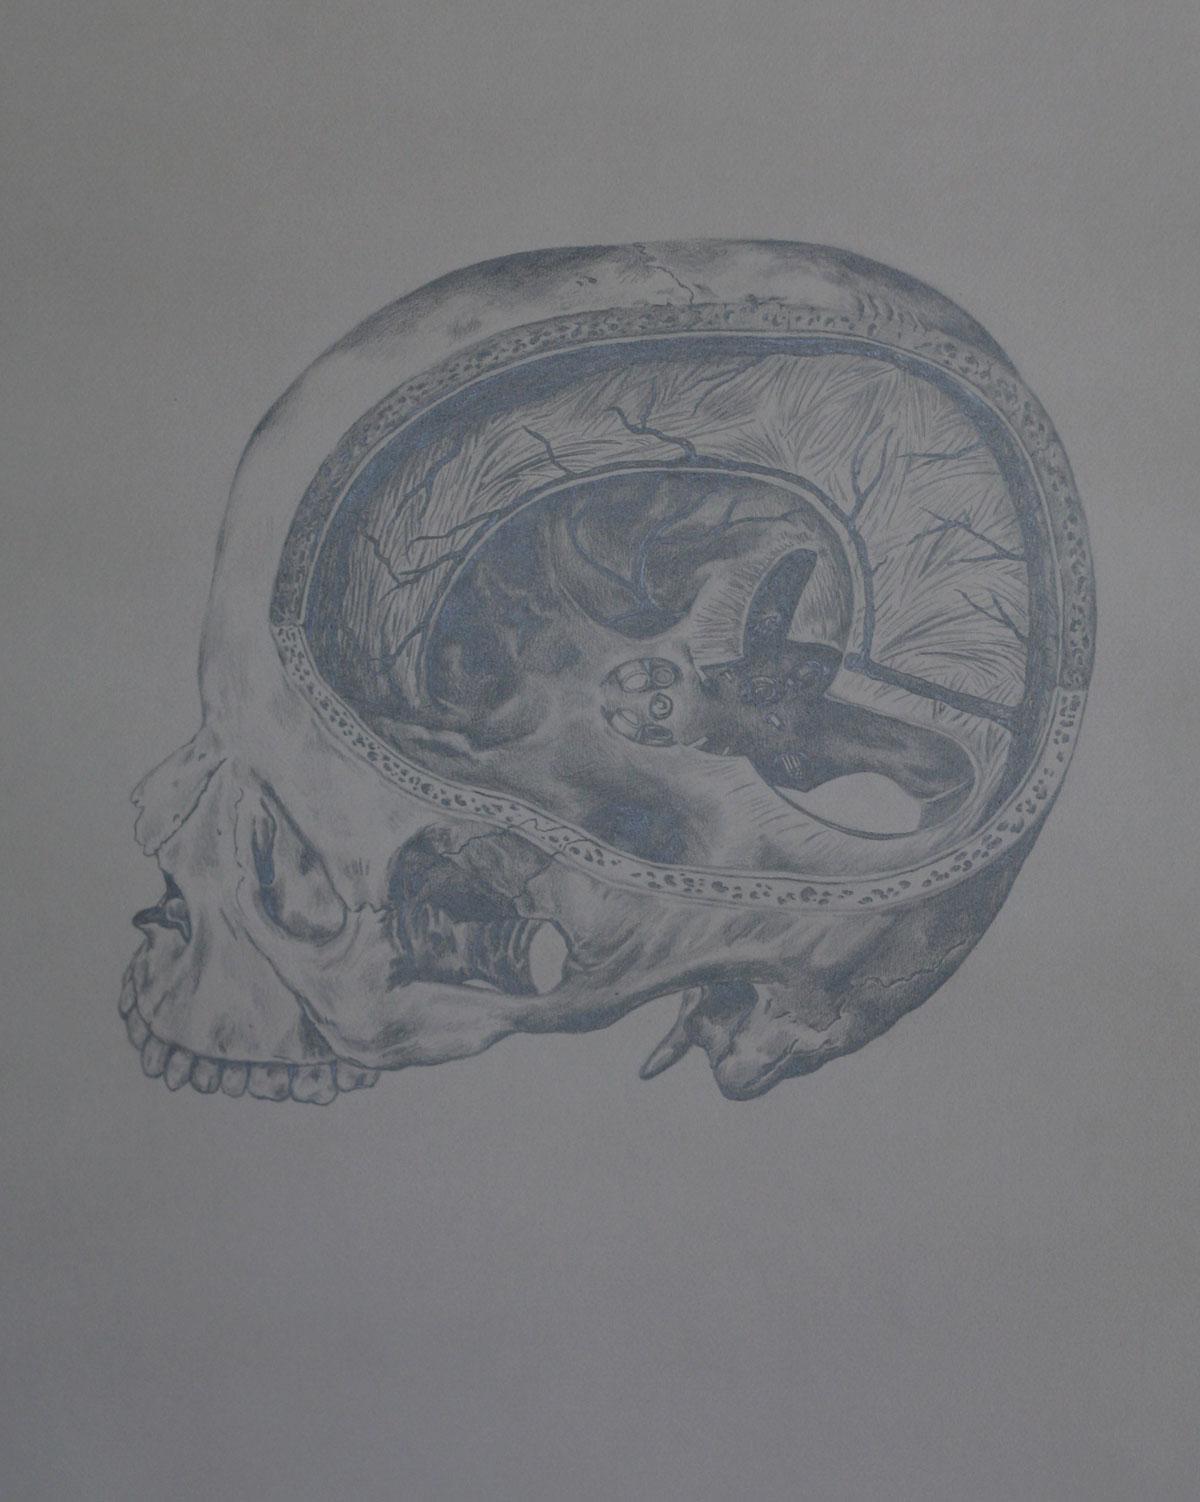 Mind and Specimen (Study no. 5)